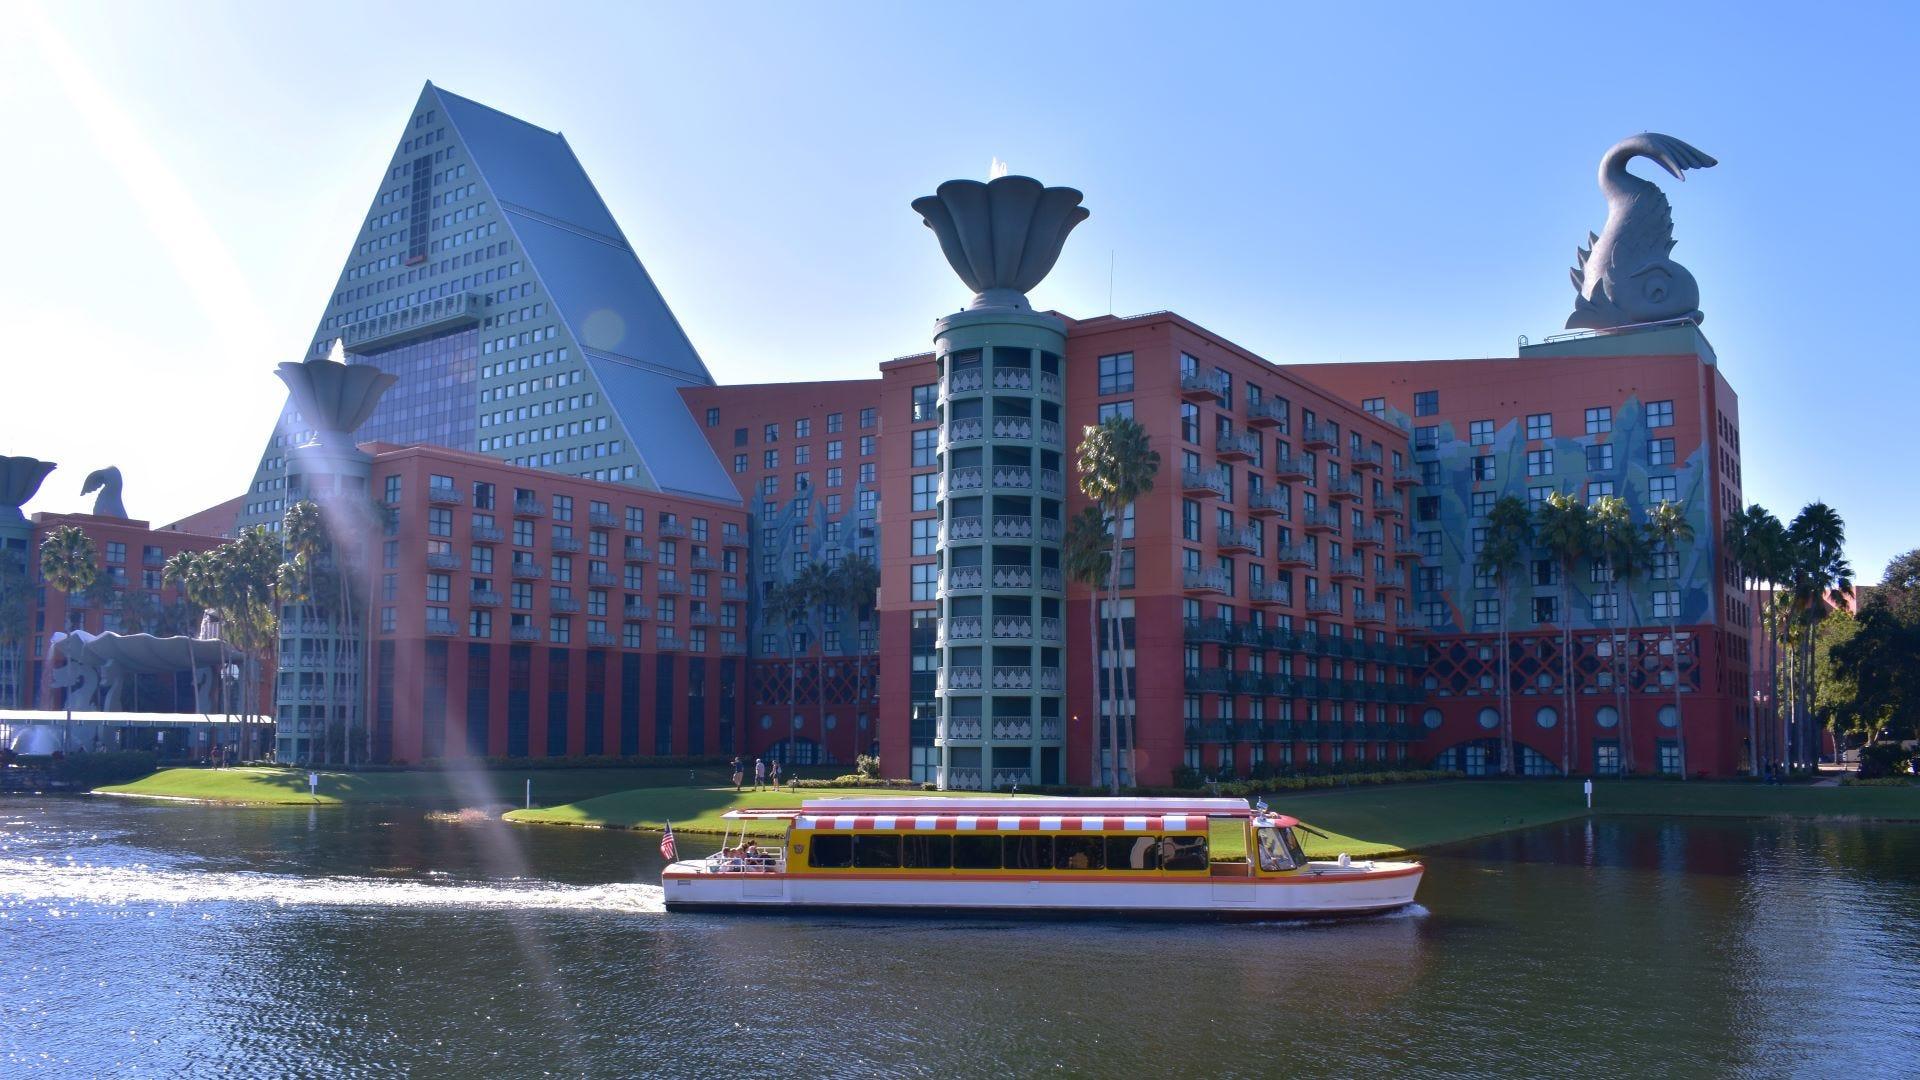 A Disney World hotel on Lake Buena Vista.